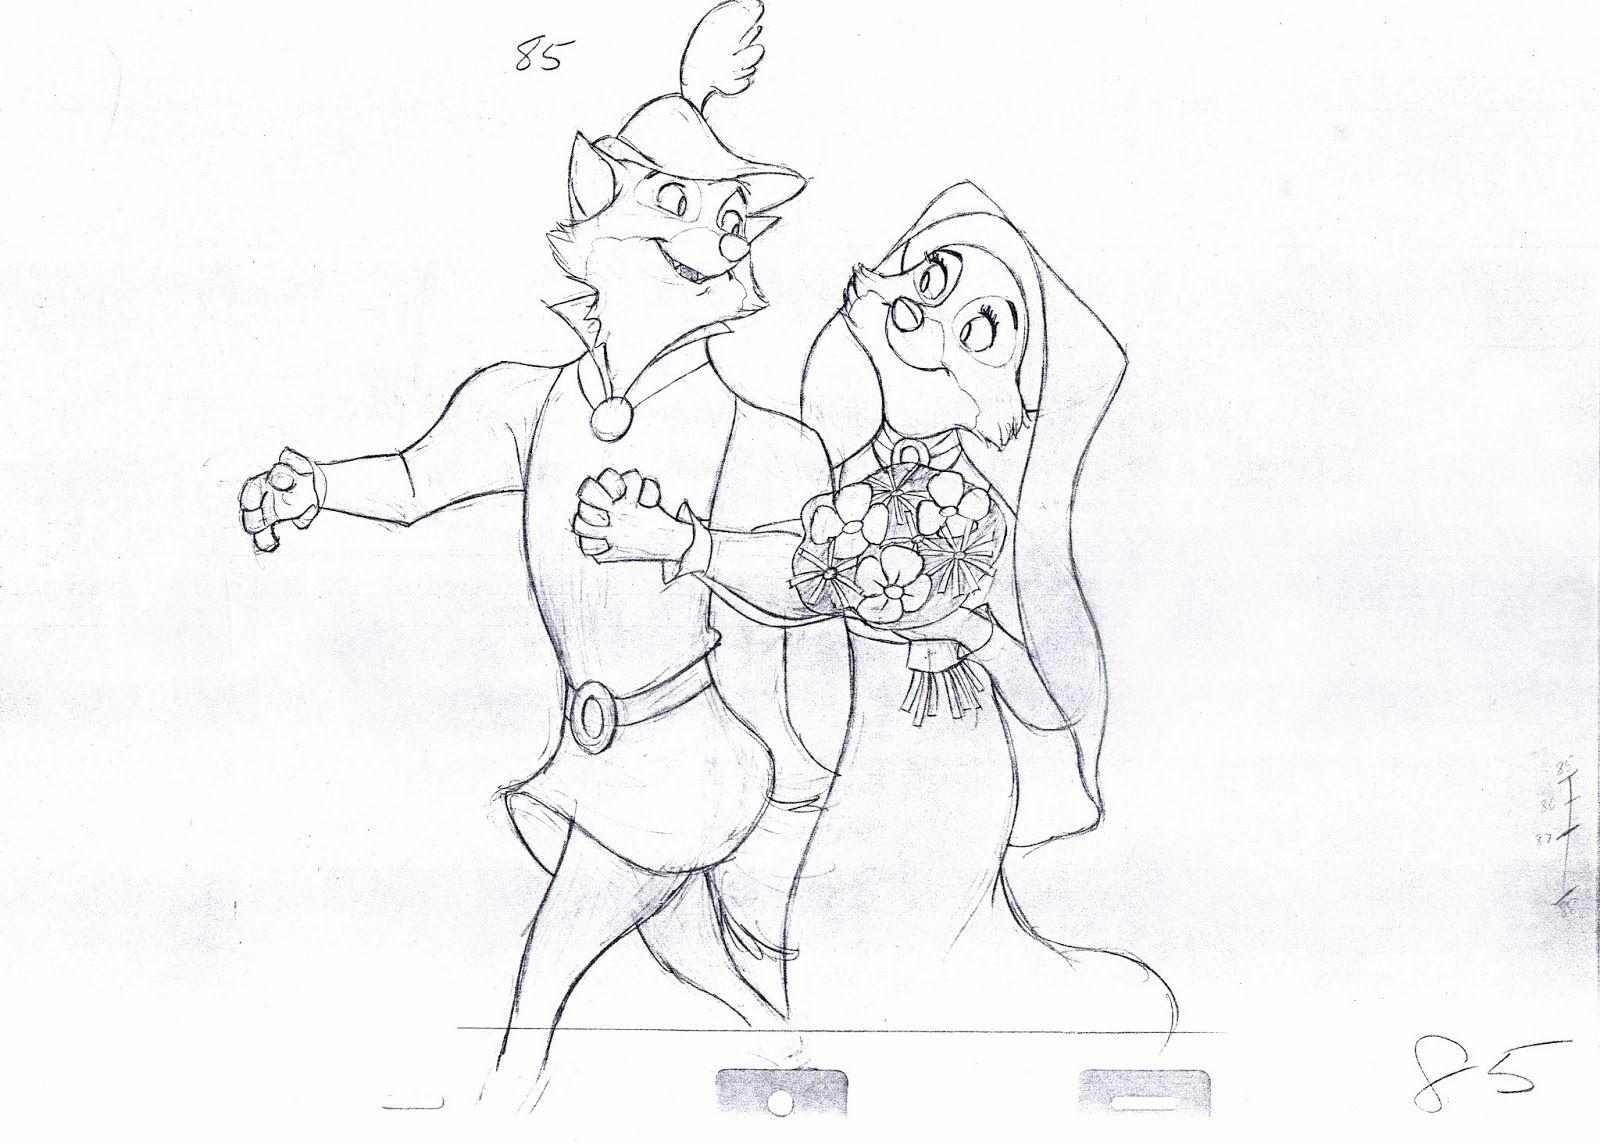 Disney Robin Hood: Production Production Drawing: Original